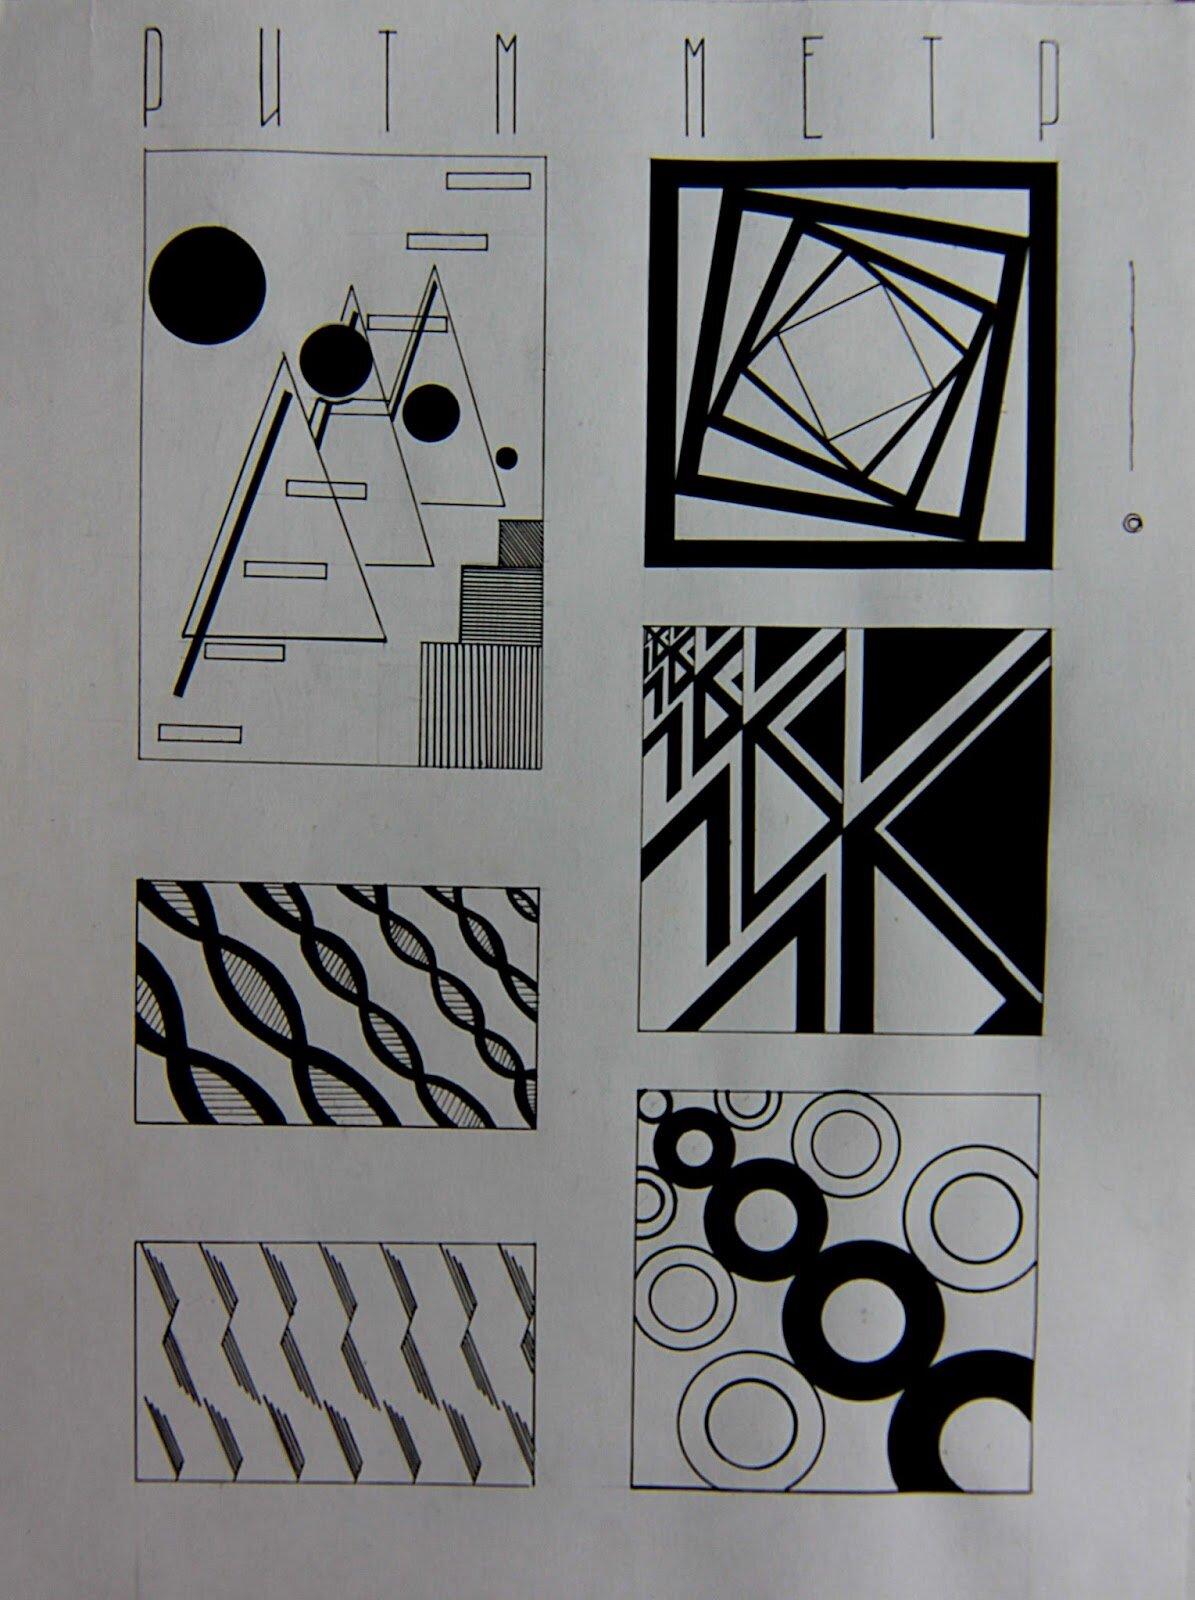 Картинки по композиции ритм